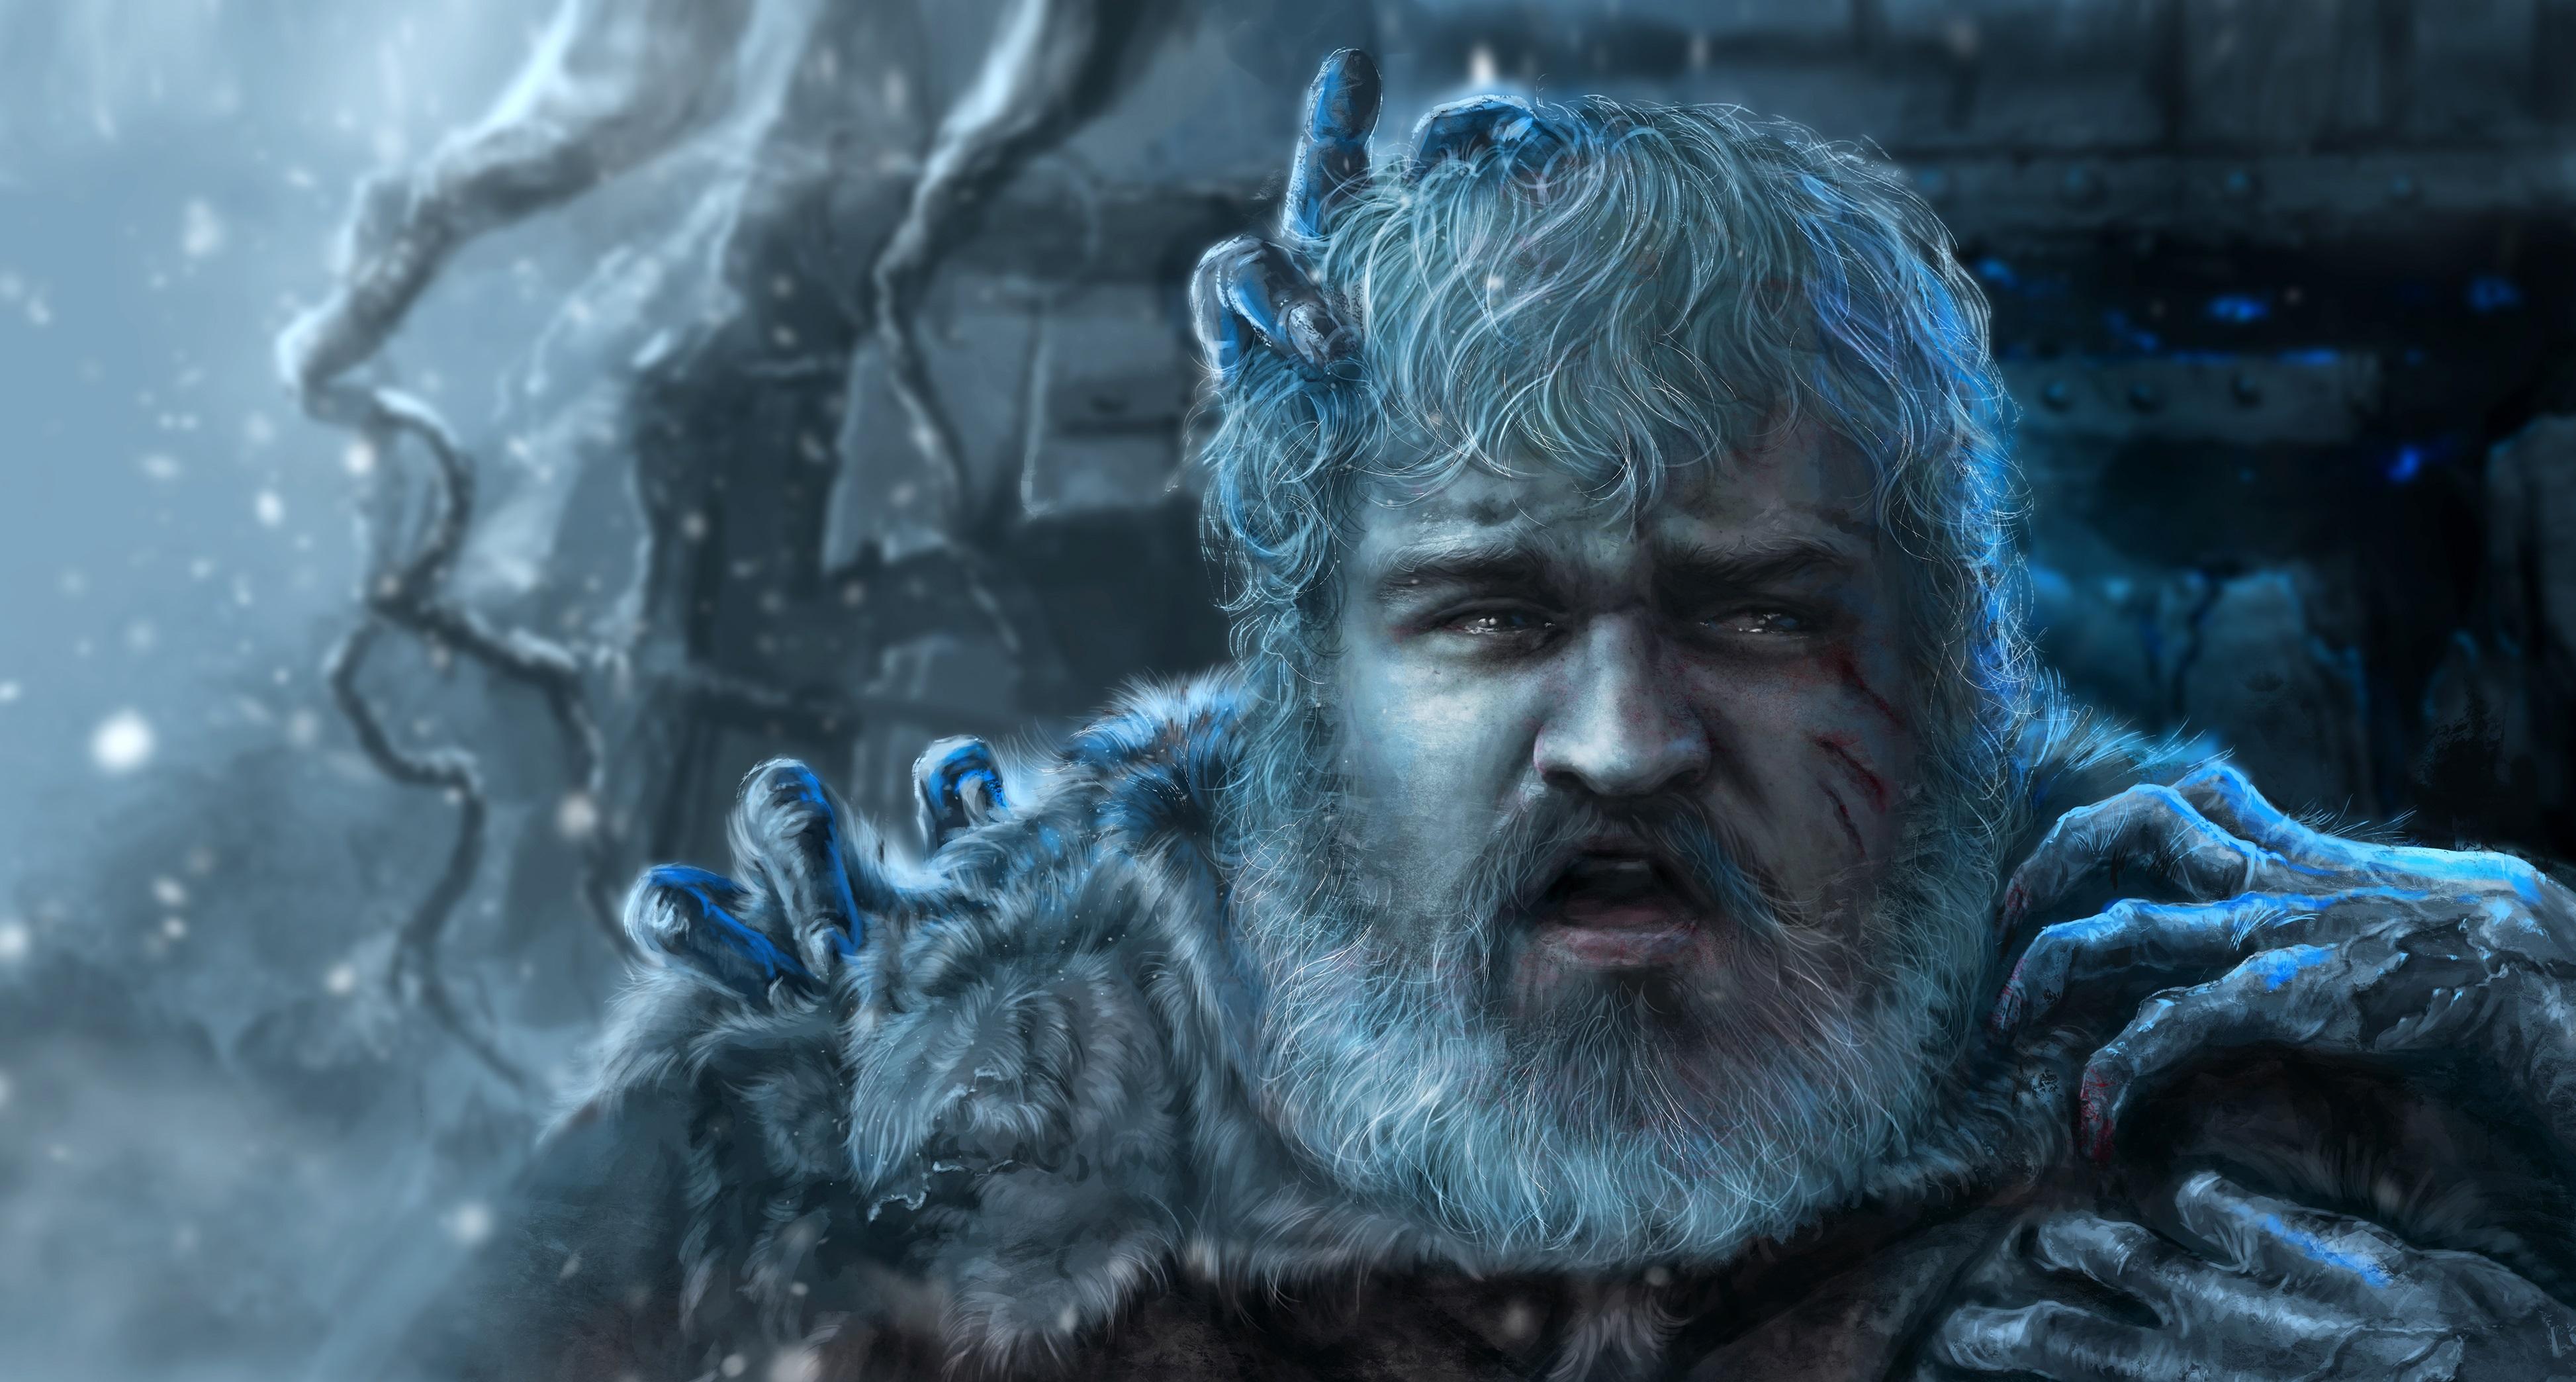 1280x1024 Hodor Game Of Thrones Art 1280x1024 Resolution Hd 4k